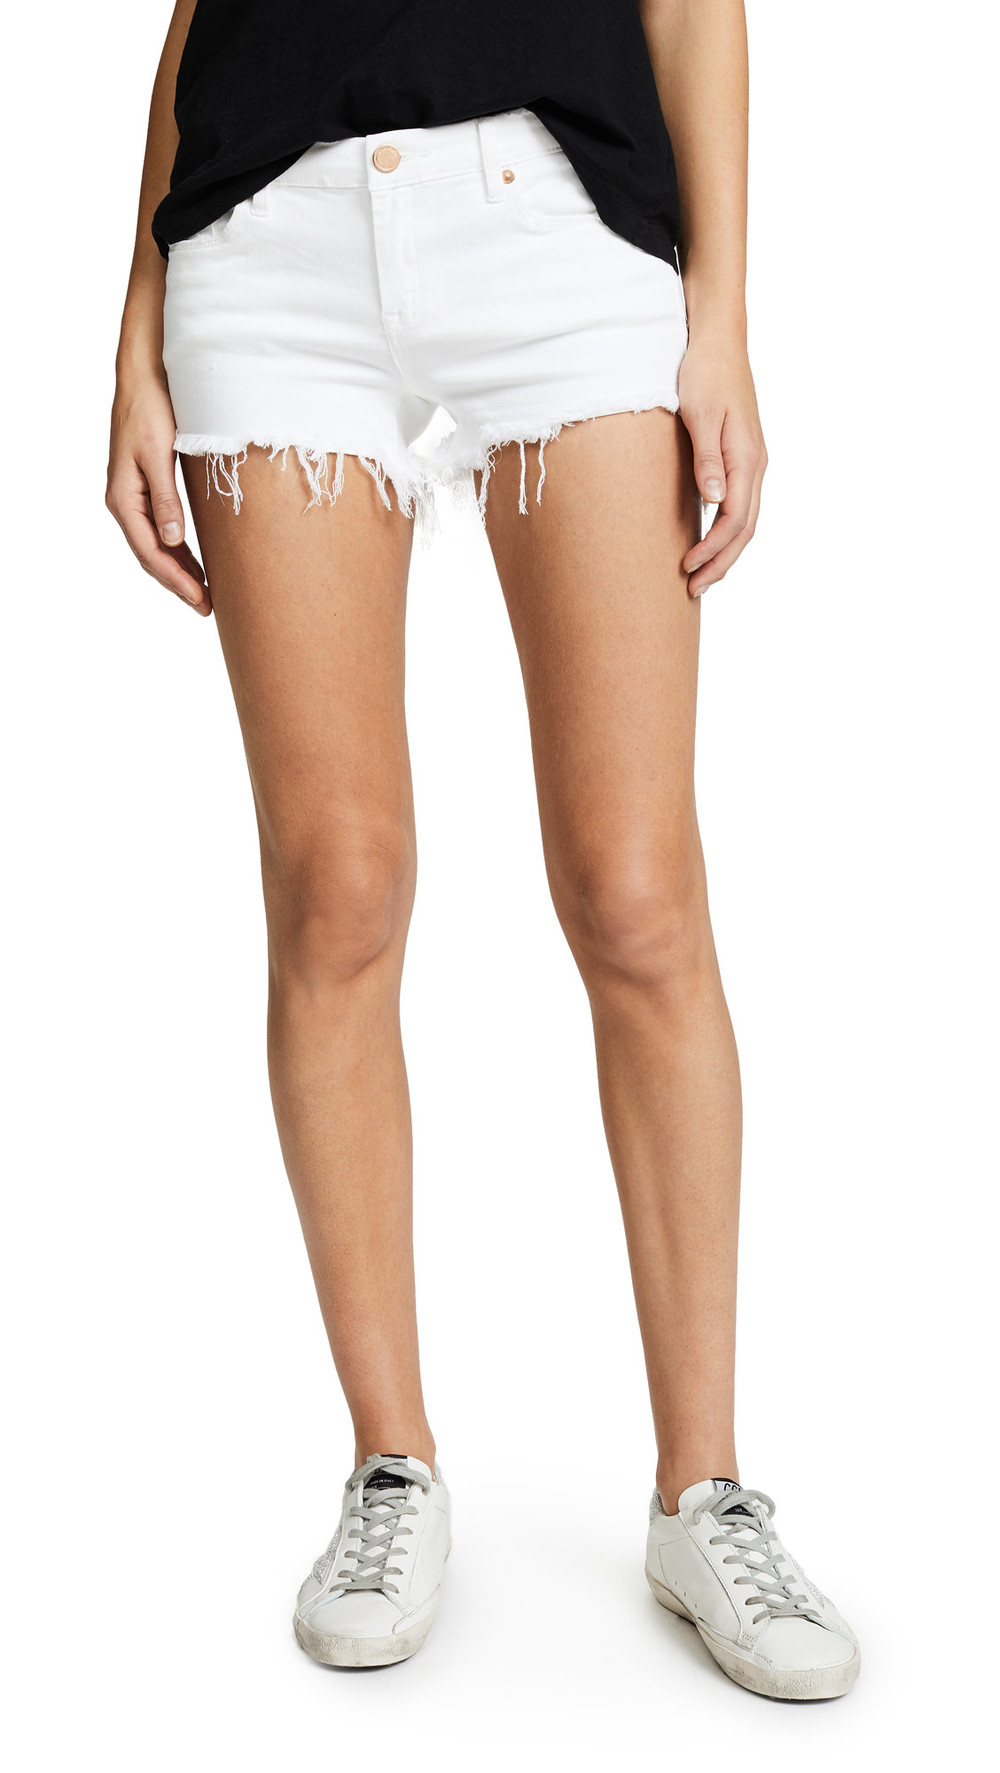 Blank Denim Cutoff Shorts in white